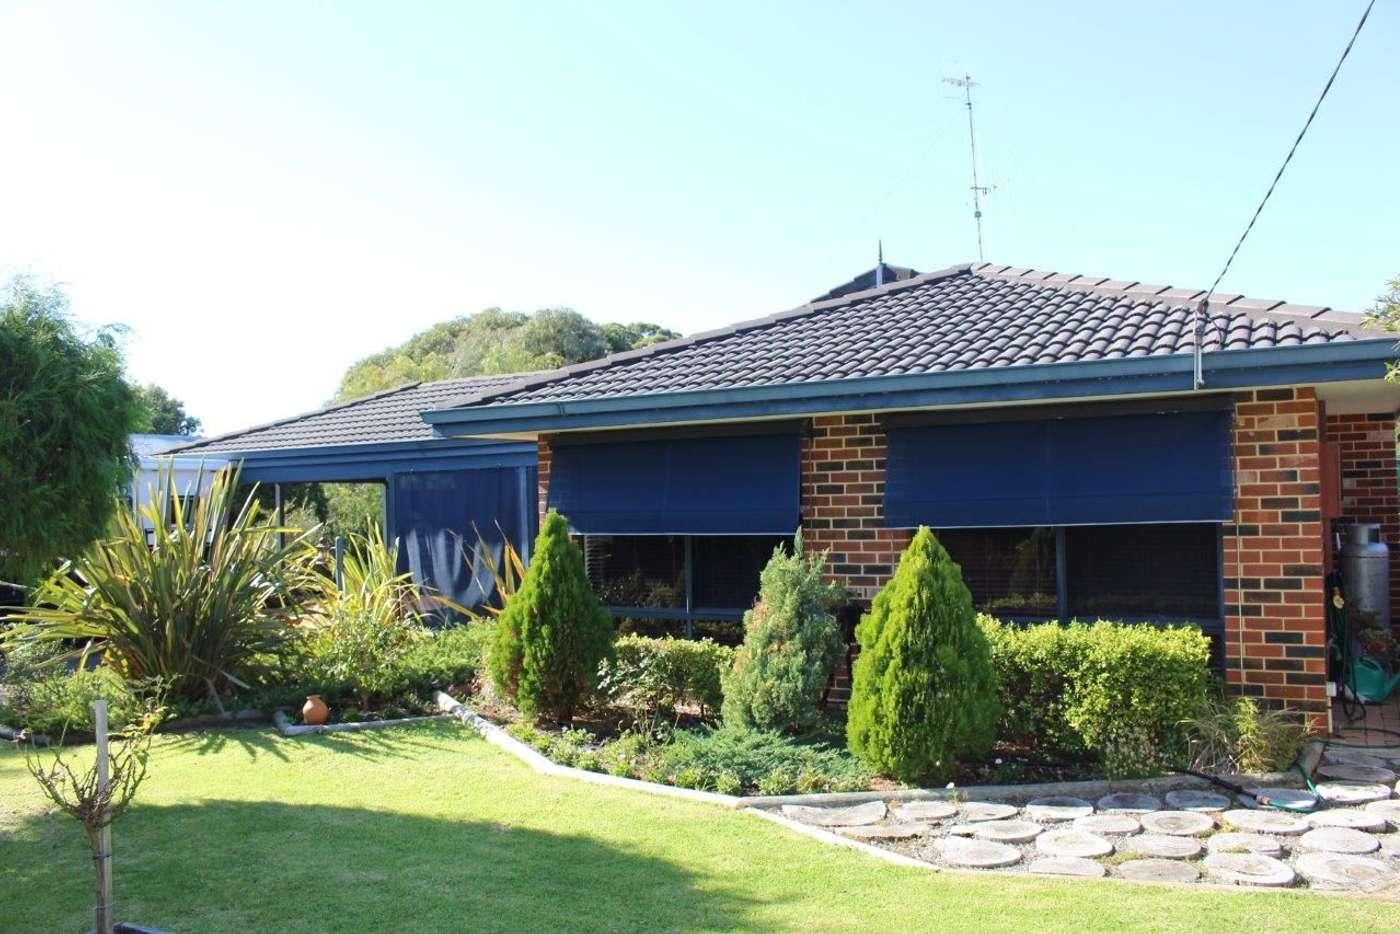 Main view of Homely house listing, 519 Ocean Beach Road, Denmark WA 6333